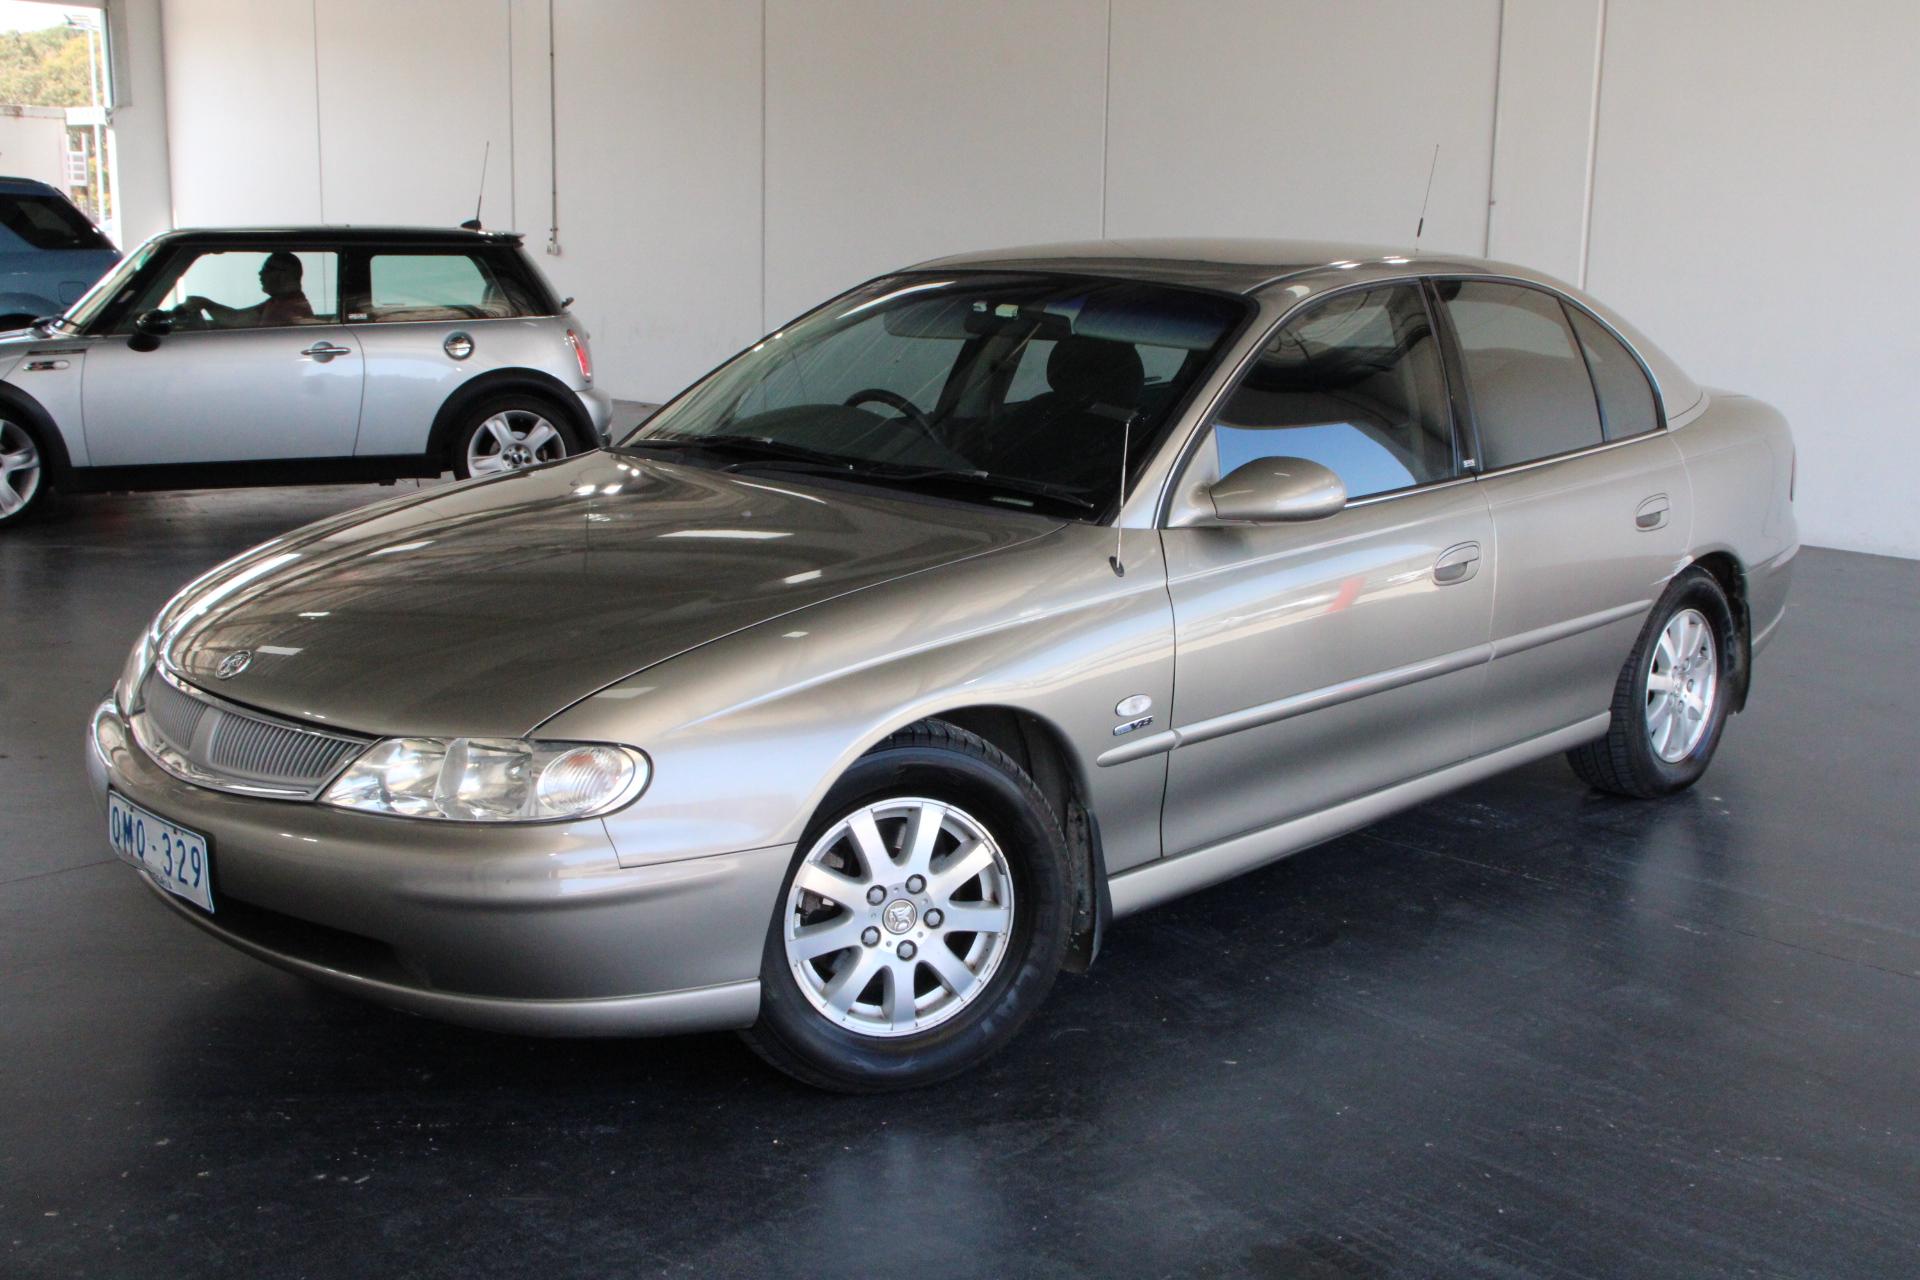 2001 Holden Berlina VX V8 Automatic Sedan